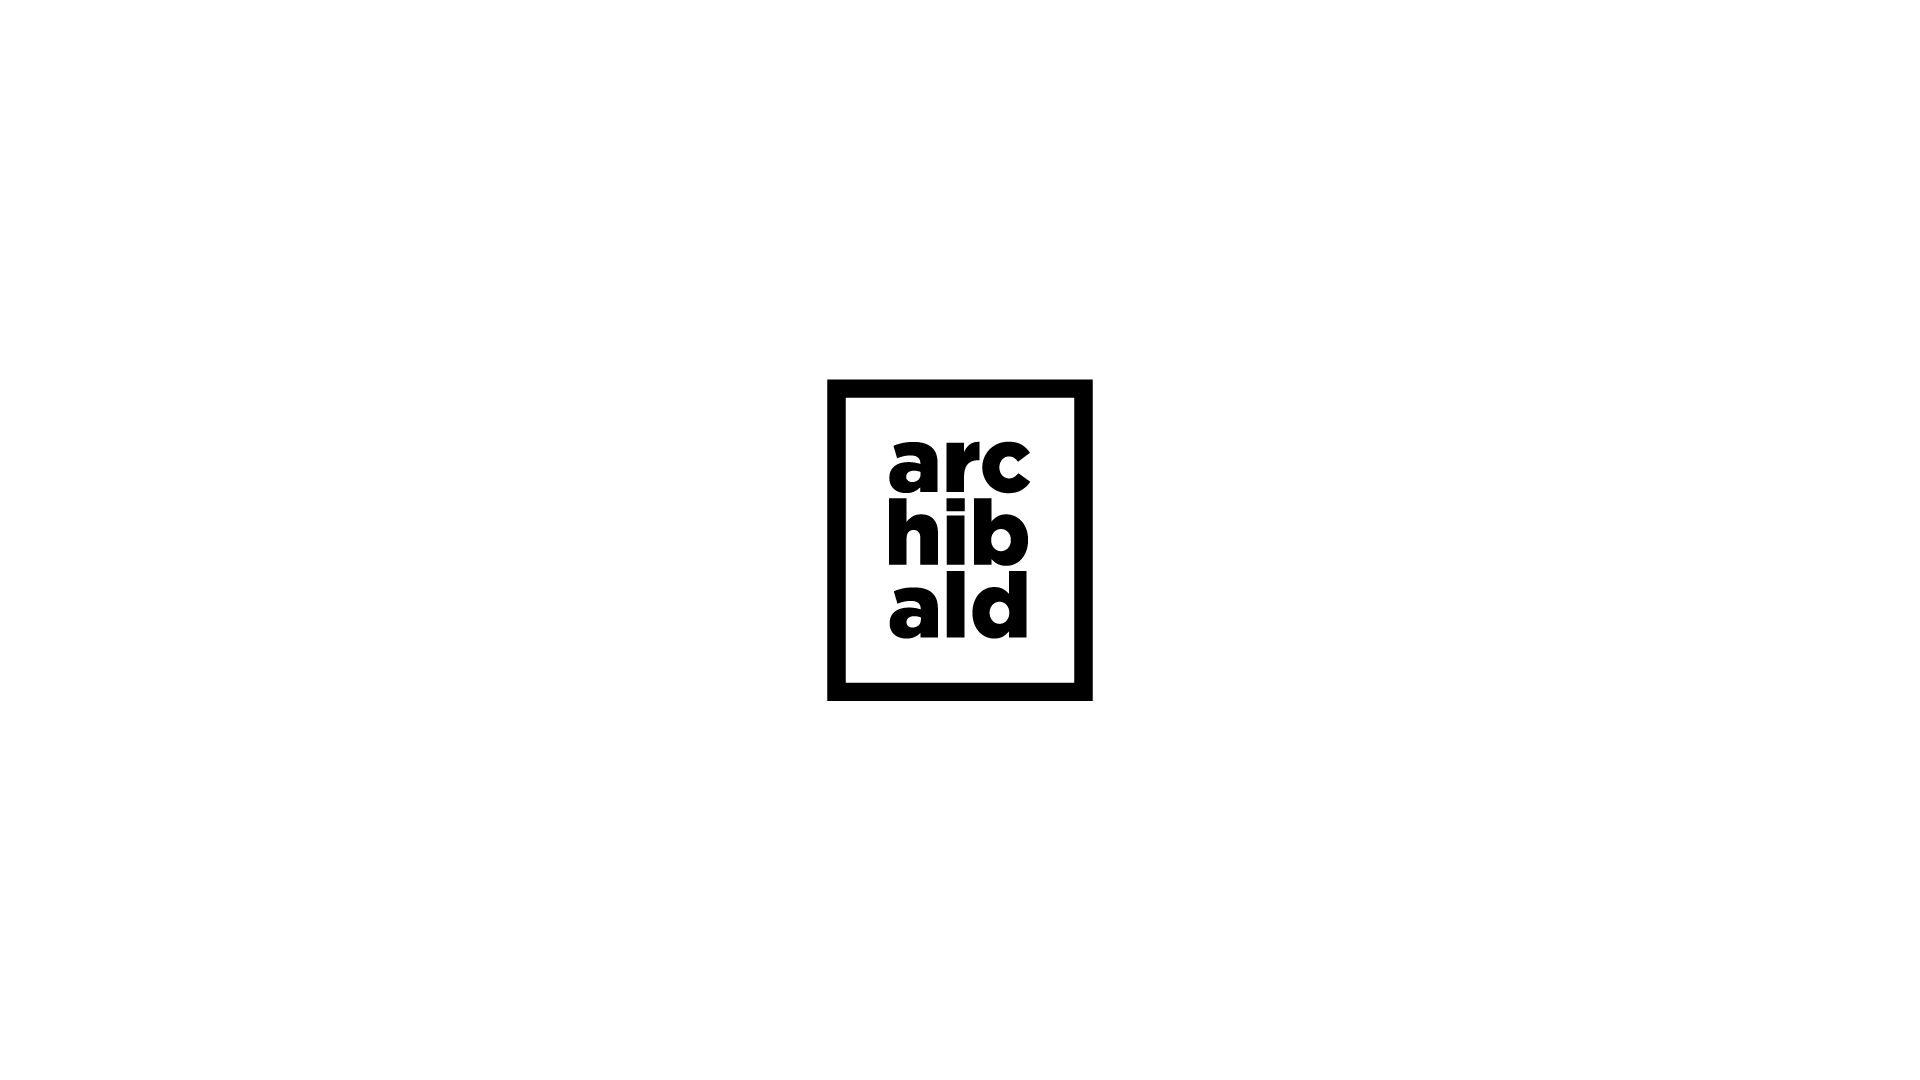 archibald-logo-positive